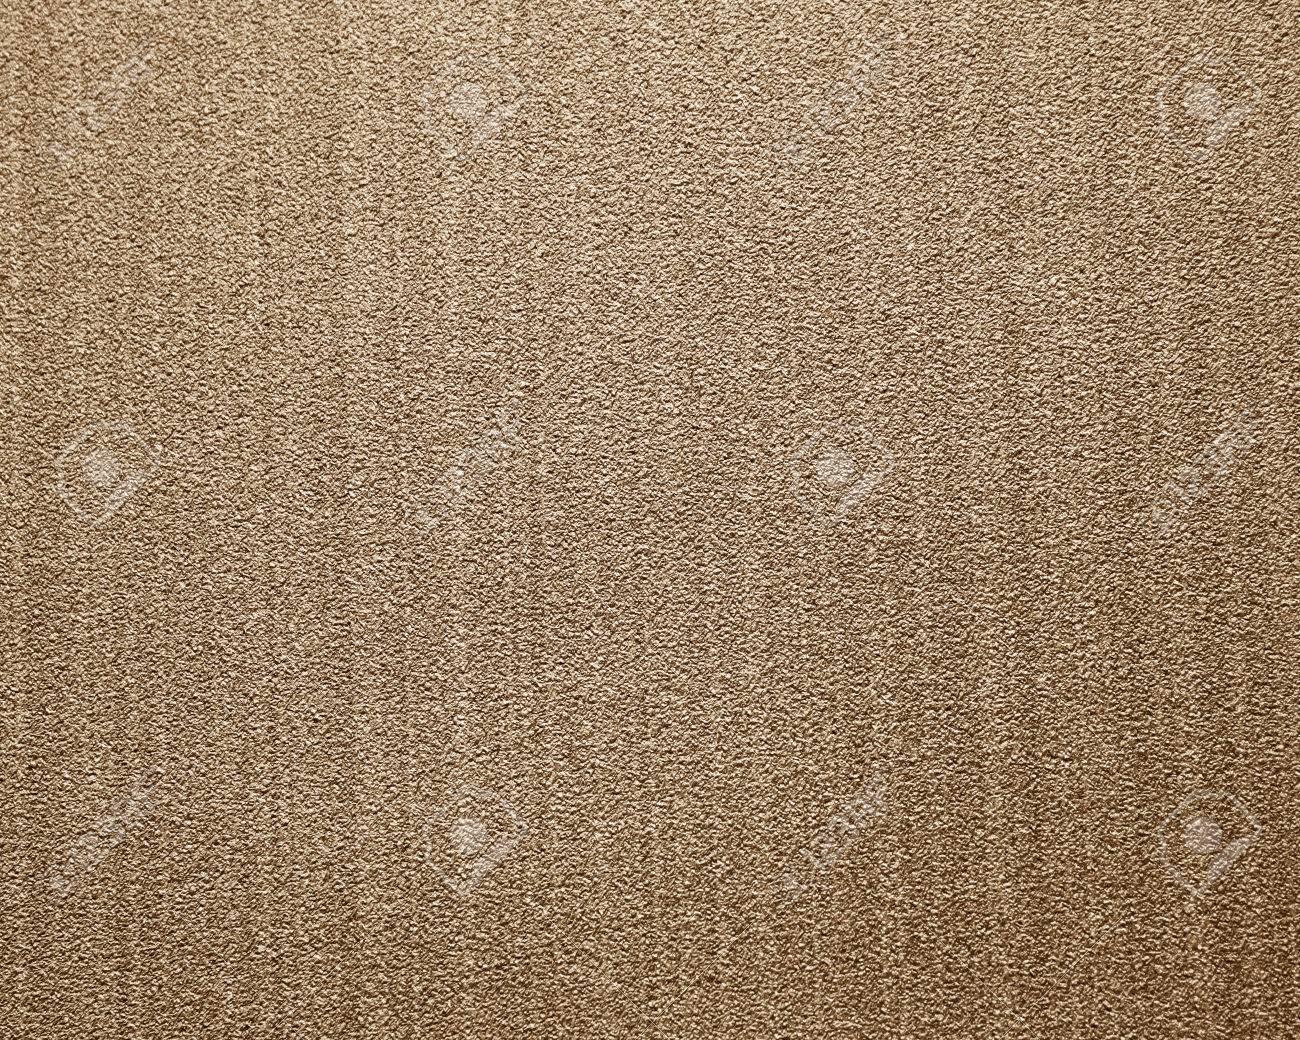 Interior wallpaper texture - Vintage Vinyl Wallpaper Wall Background Texture Interior Stock Photo 30508711